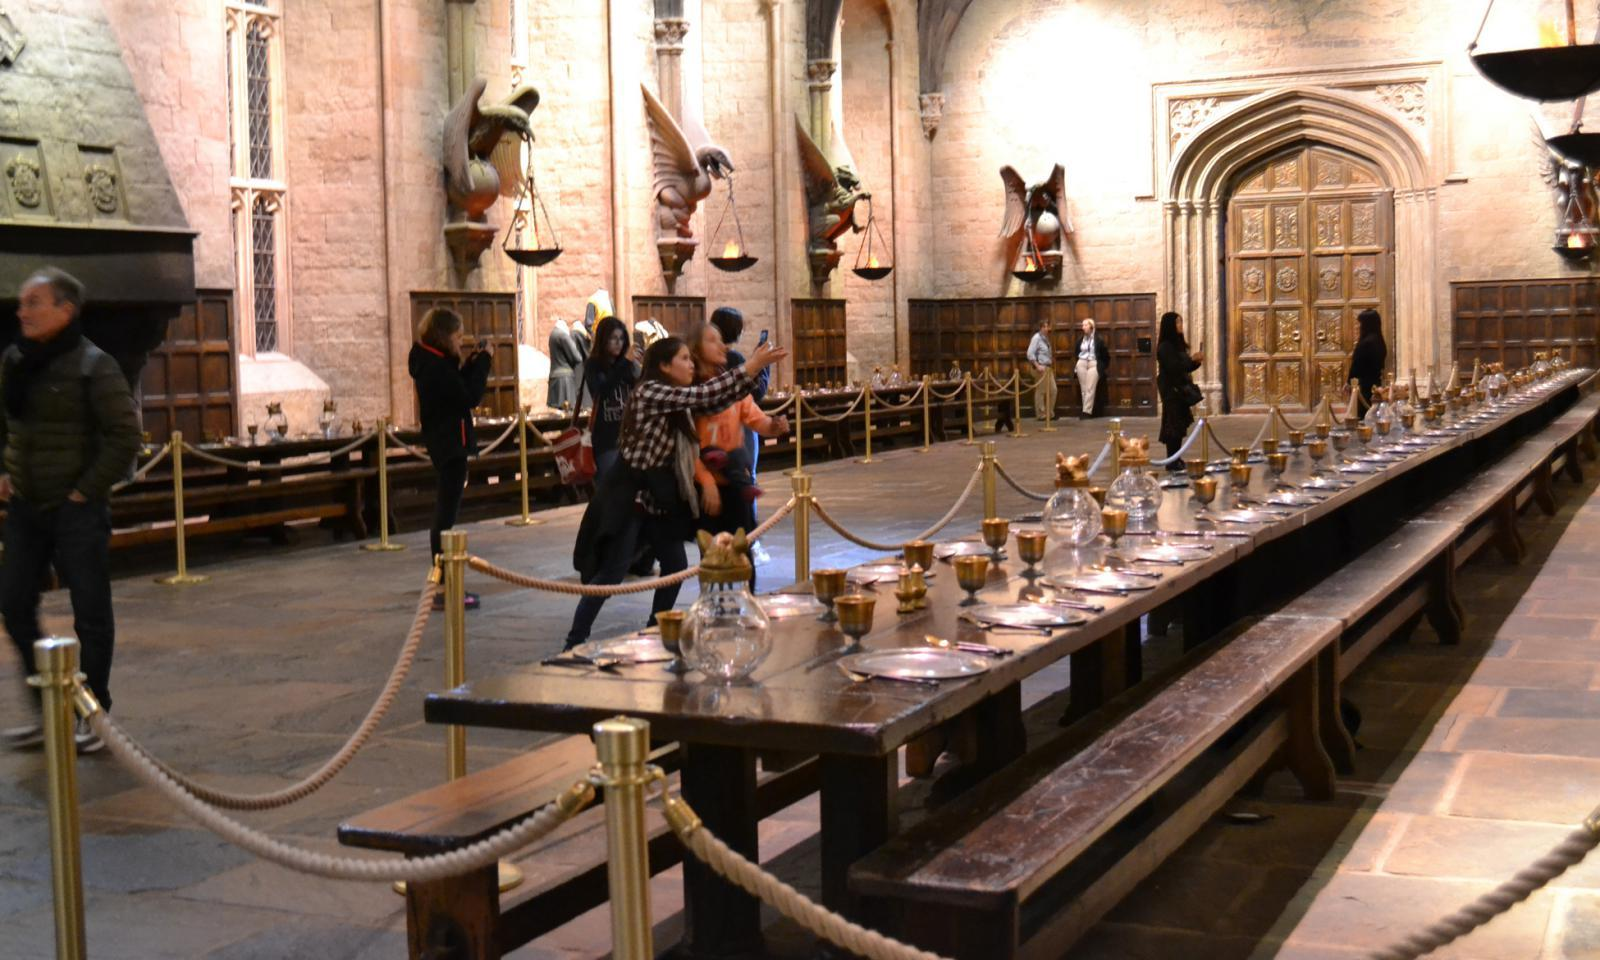 Warner Brothers Harry Potter Tour